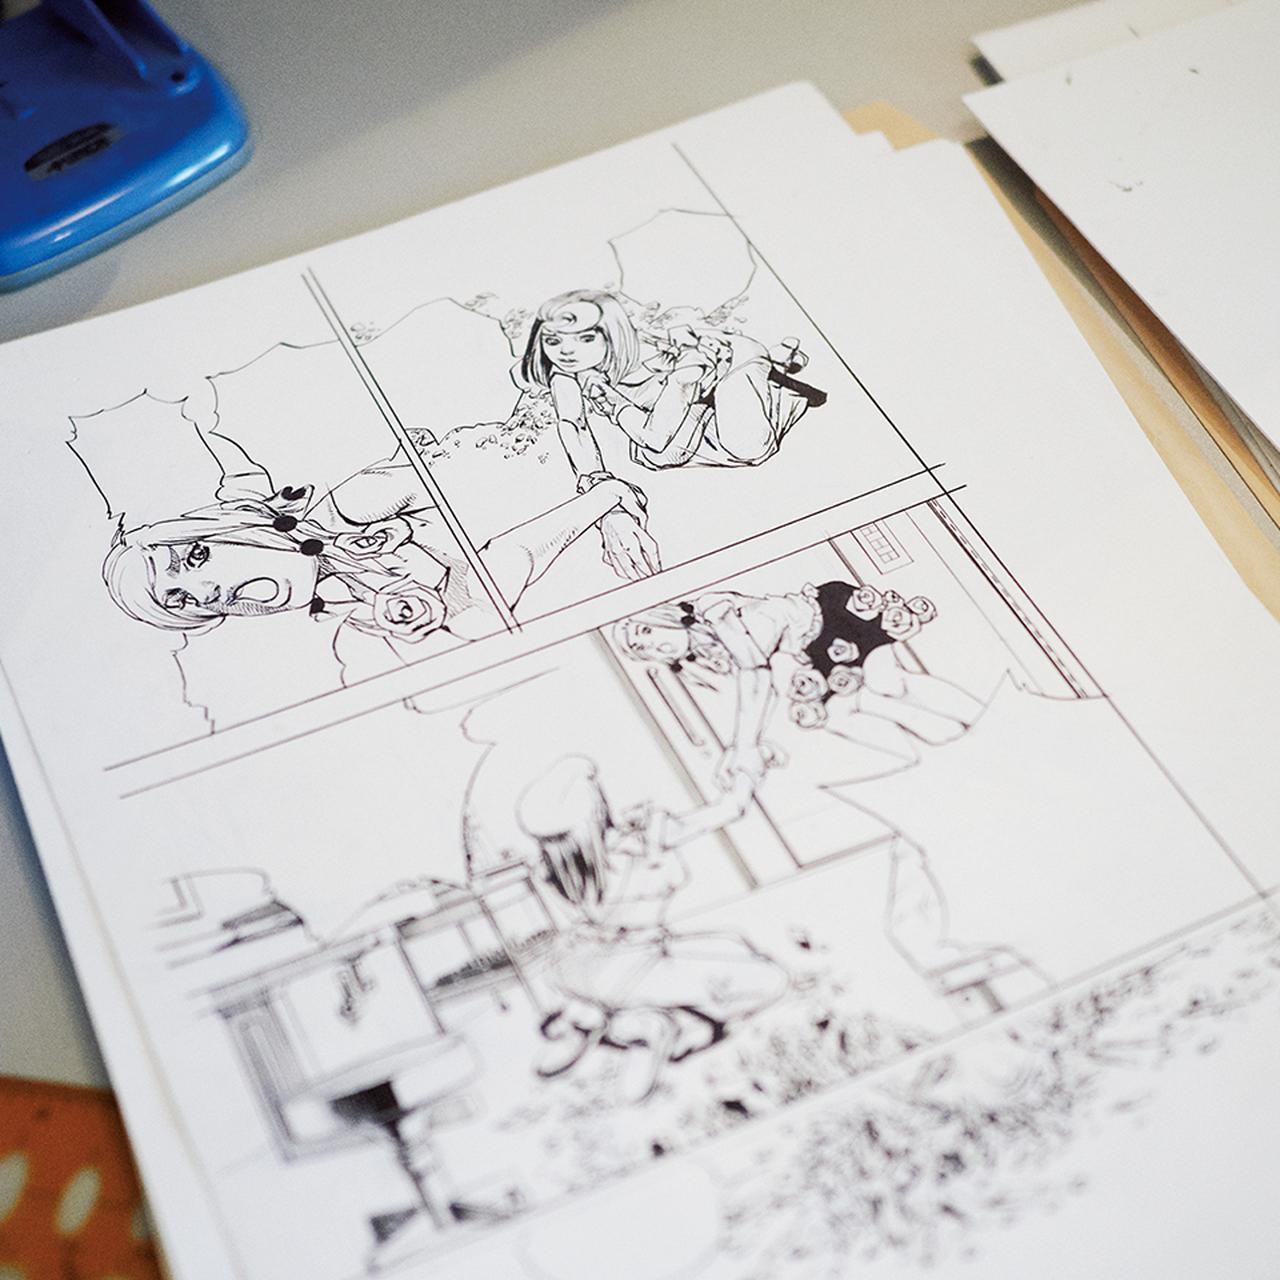 Images : 19番目の画像 - 「スペシャル インタビュー 漫画家・荒木飛呂彦の化学反応」のアルバム - T JAPAN:The New York Times Style Magazine 公式サイト